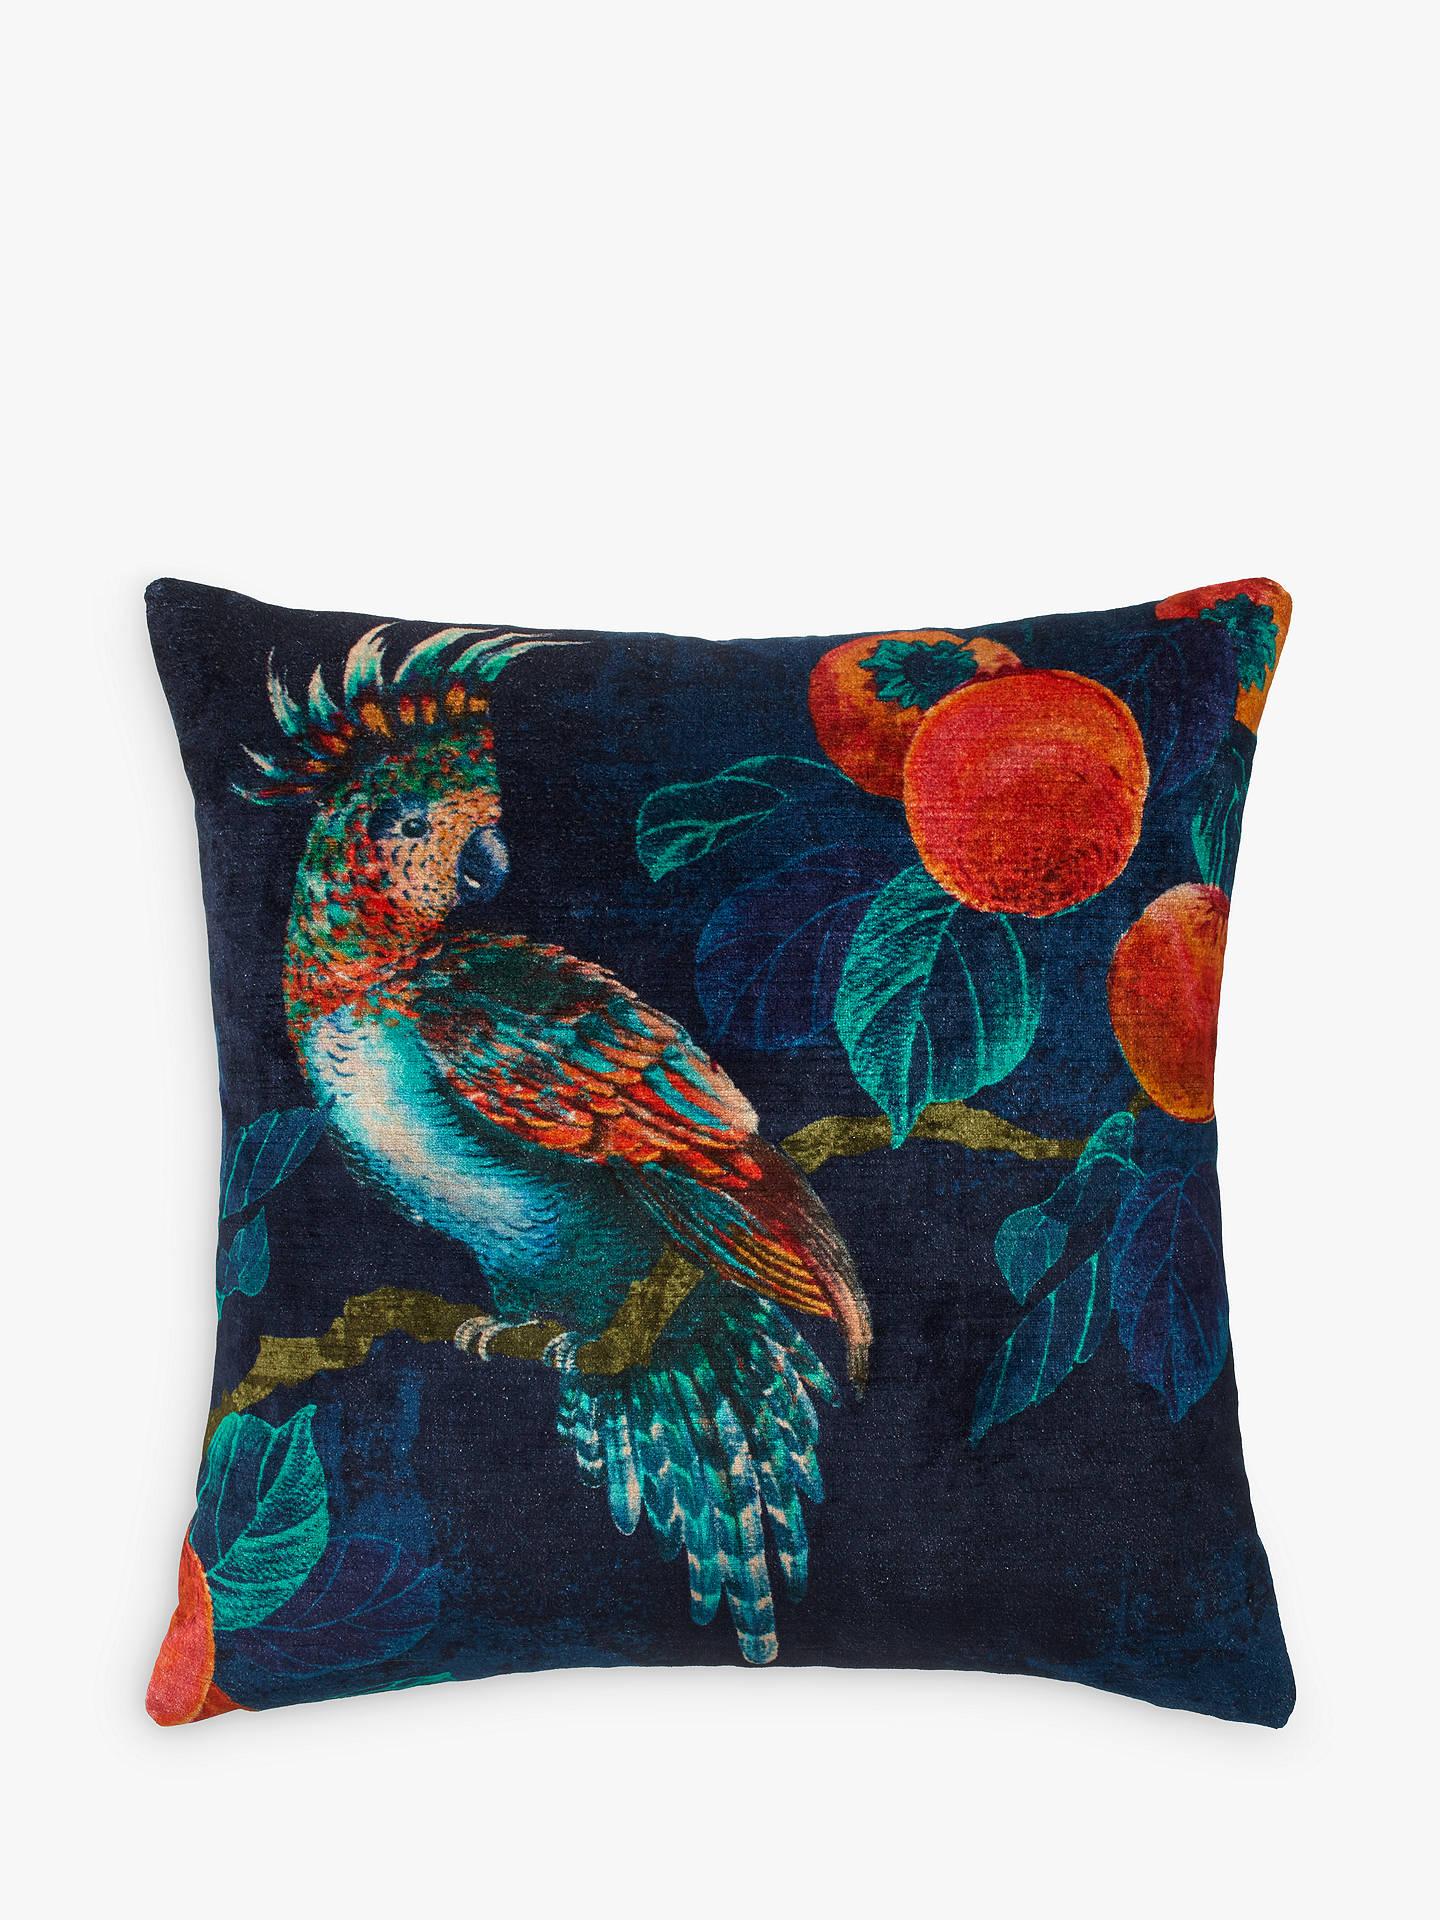 v a and john lewis tori cushion at john lewis partners. Black Bedroom Furniture Sets. Home Design Ideas